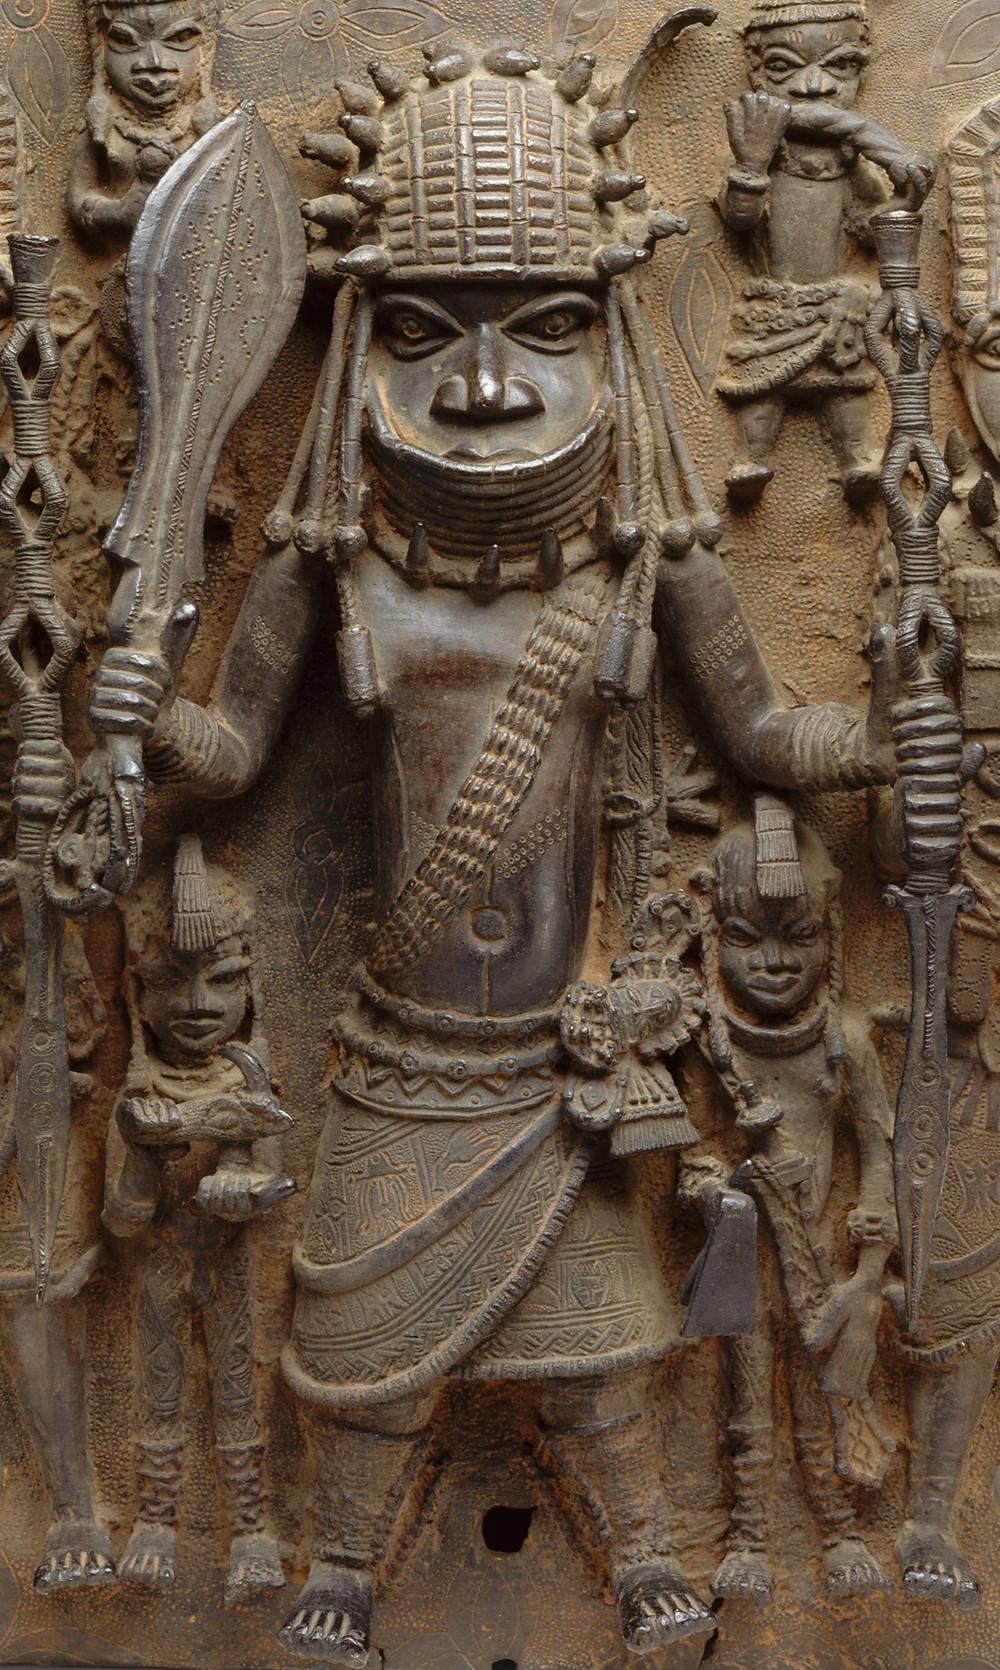 Warrior Chief, 16th-17th Century of Benin City, Nigeria